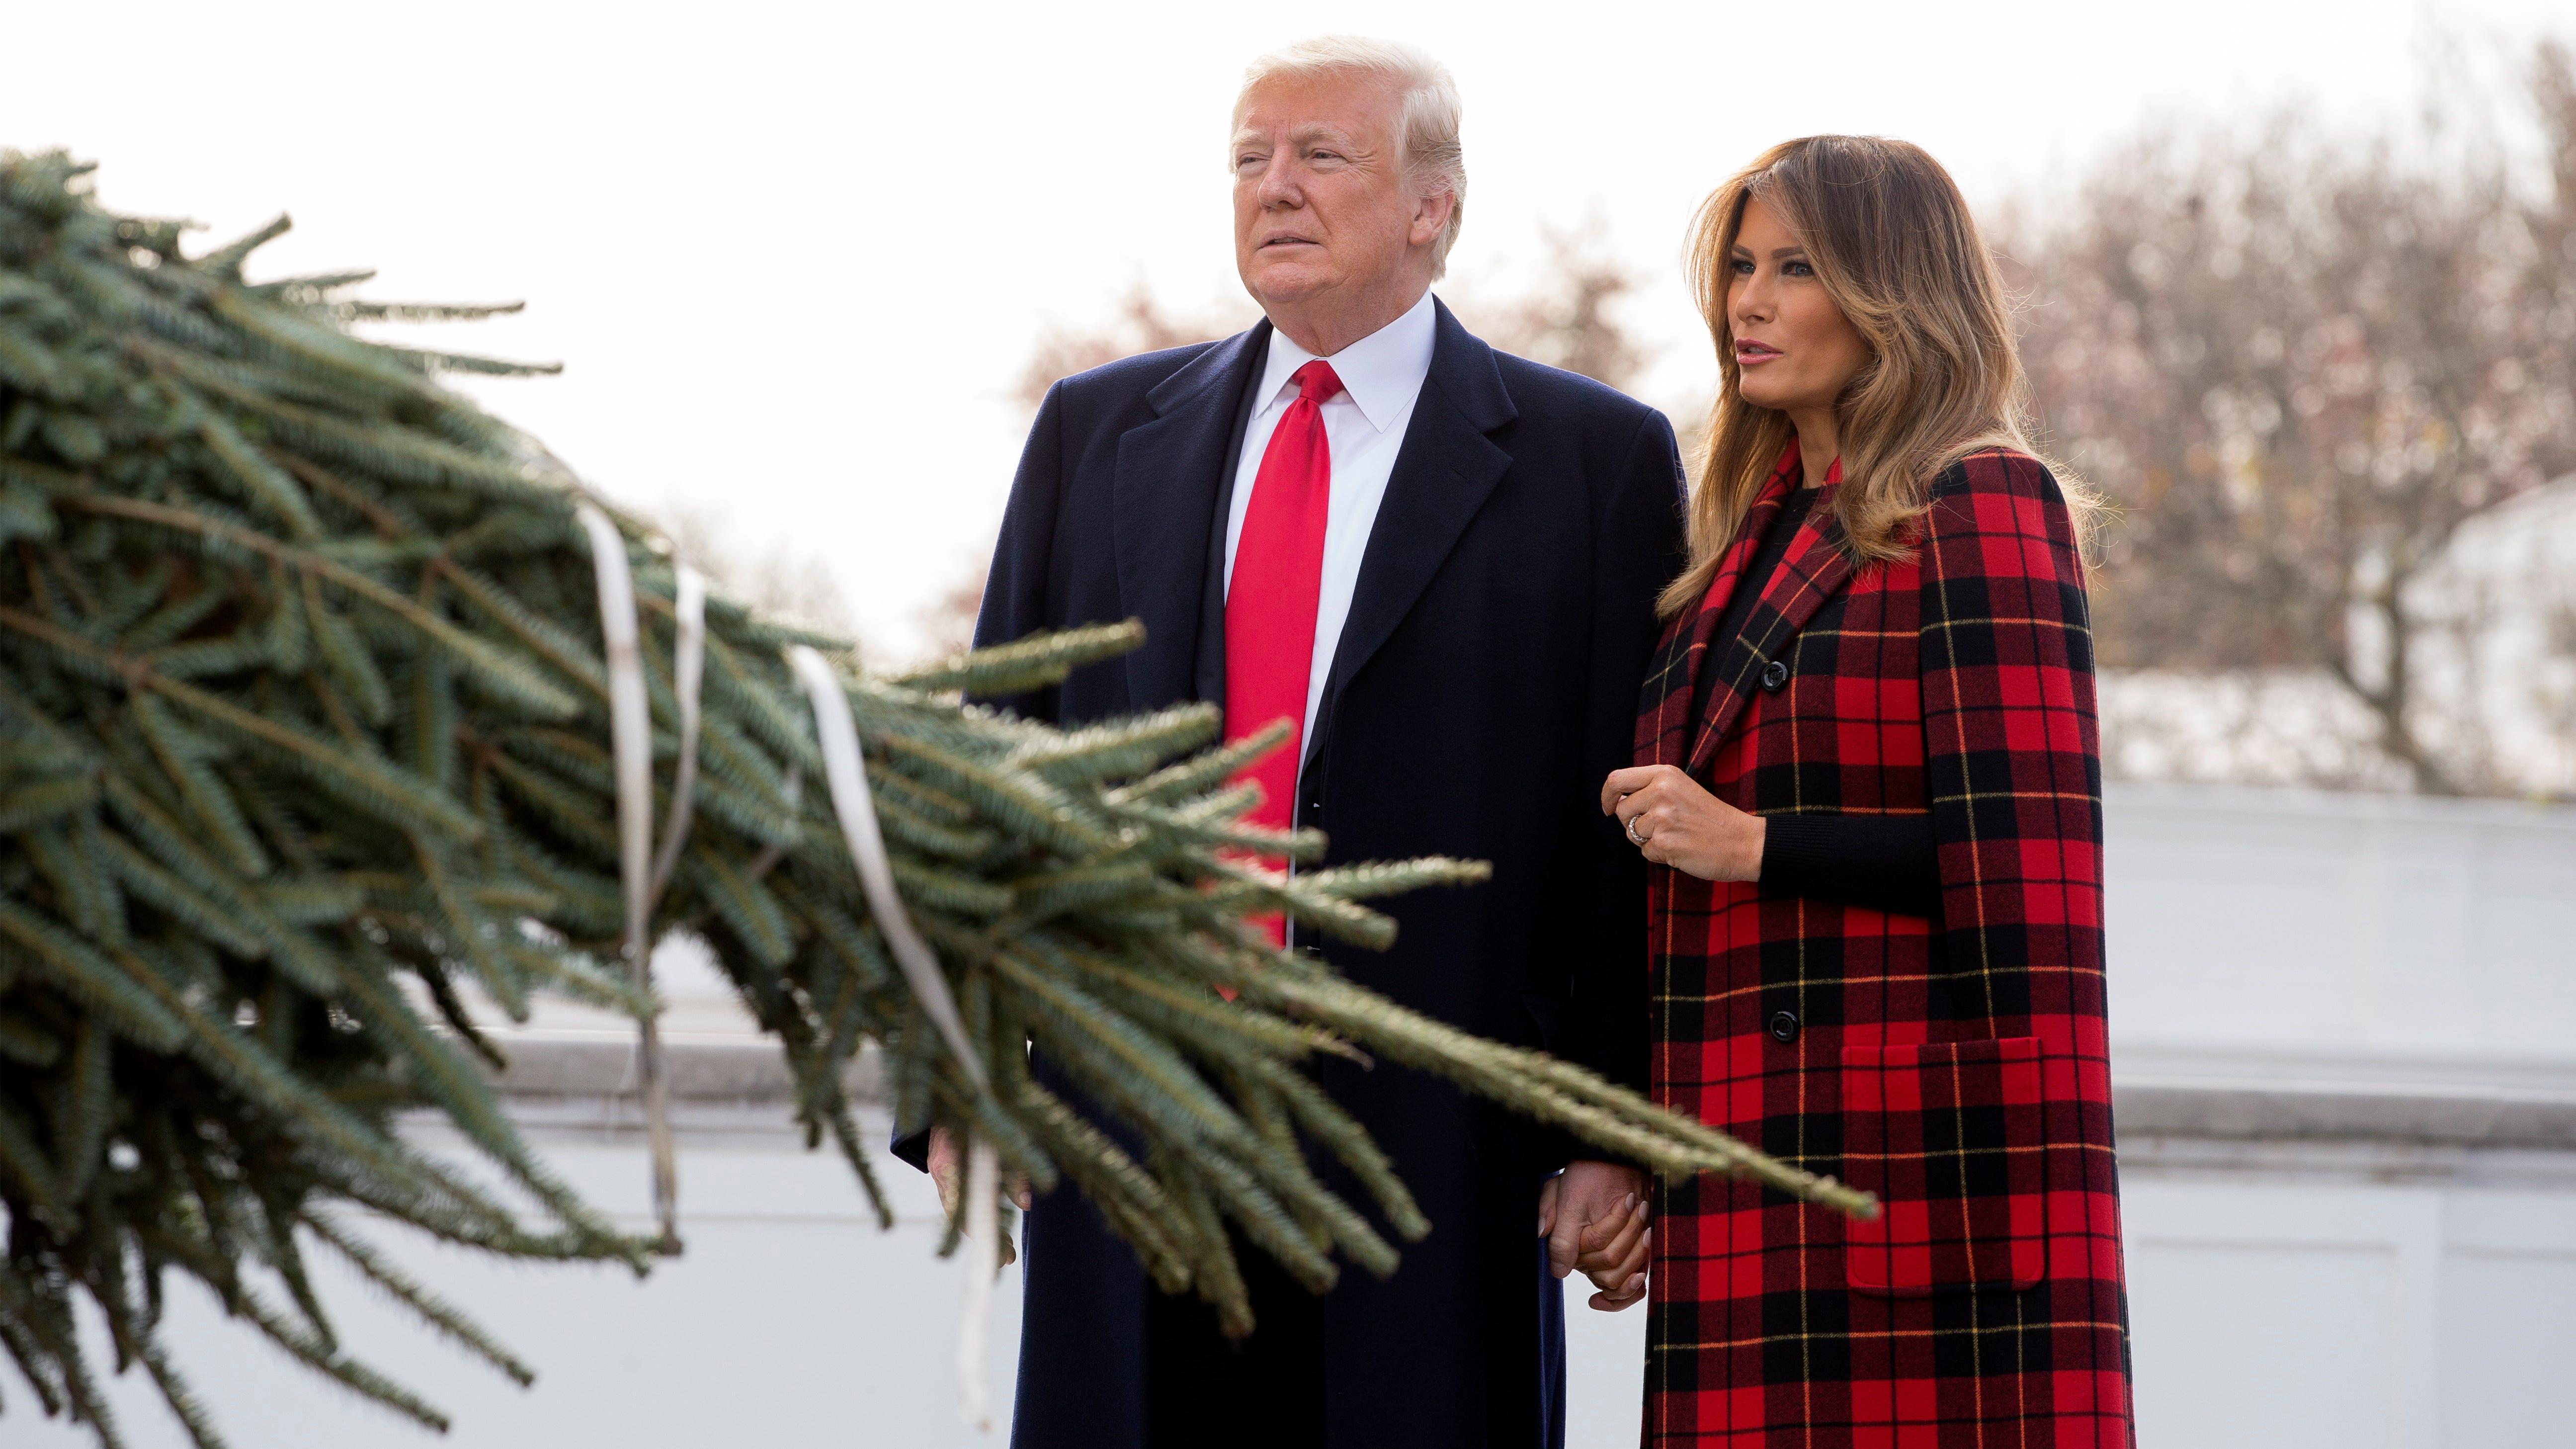 President Trump and first lady Melania Trump greet 2018 White House Christmas tree